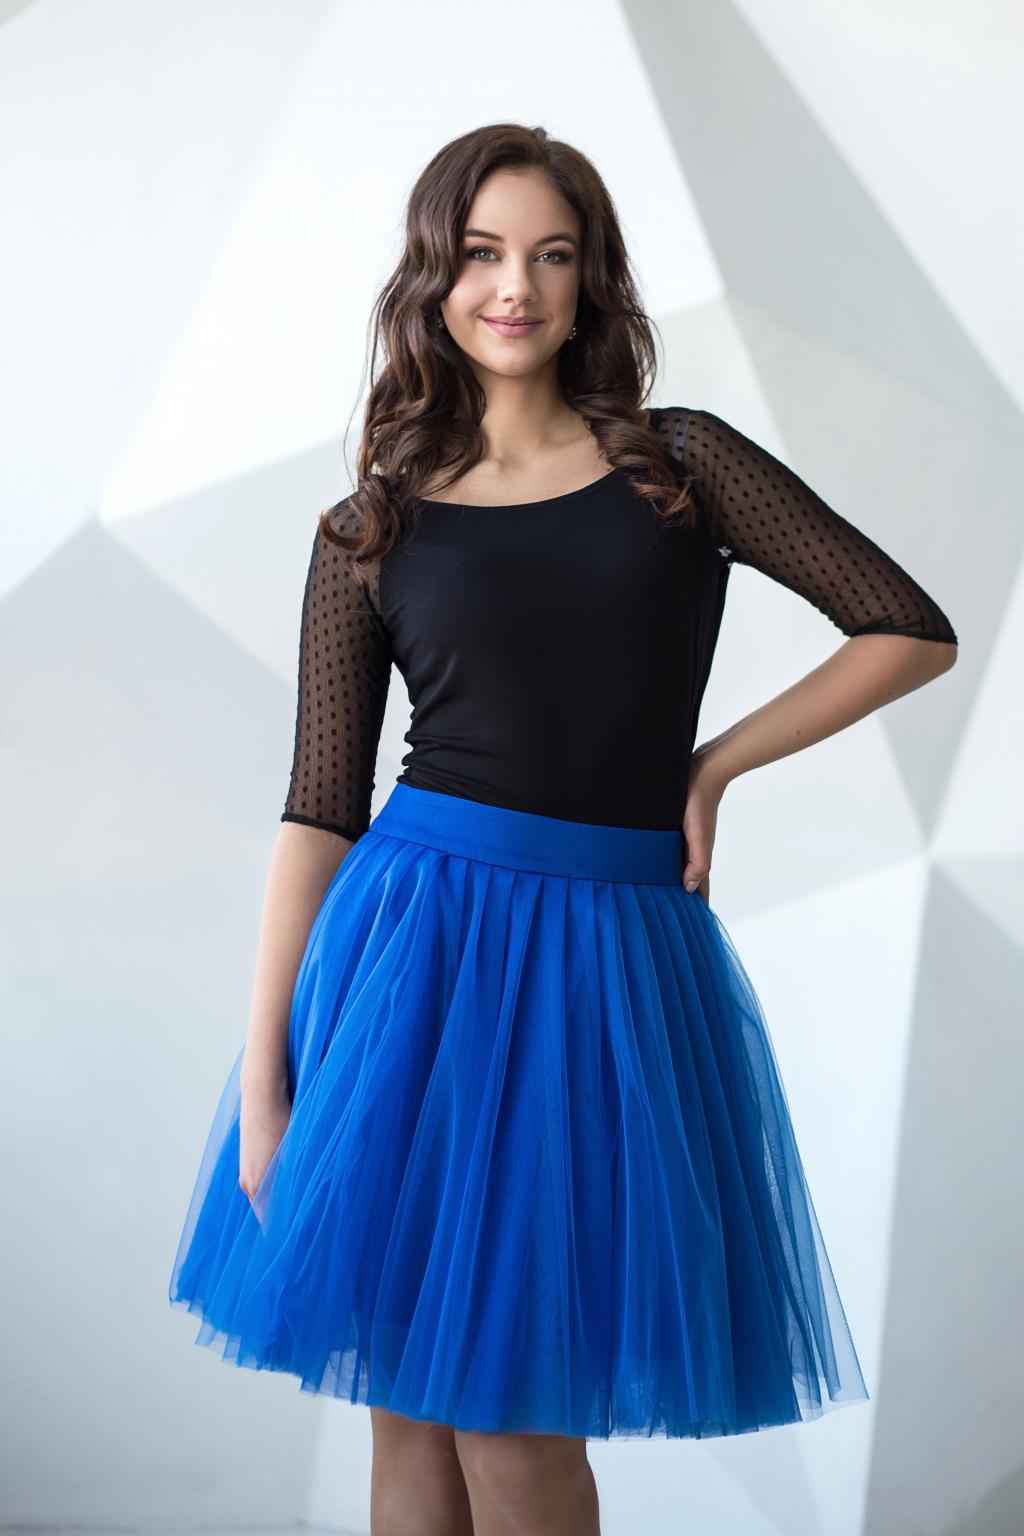 modra tutu sukne